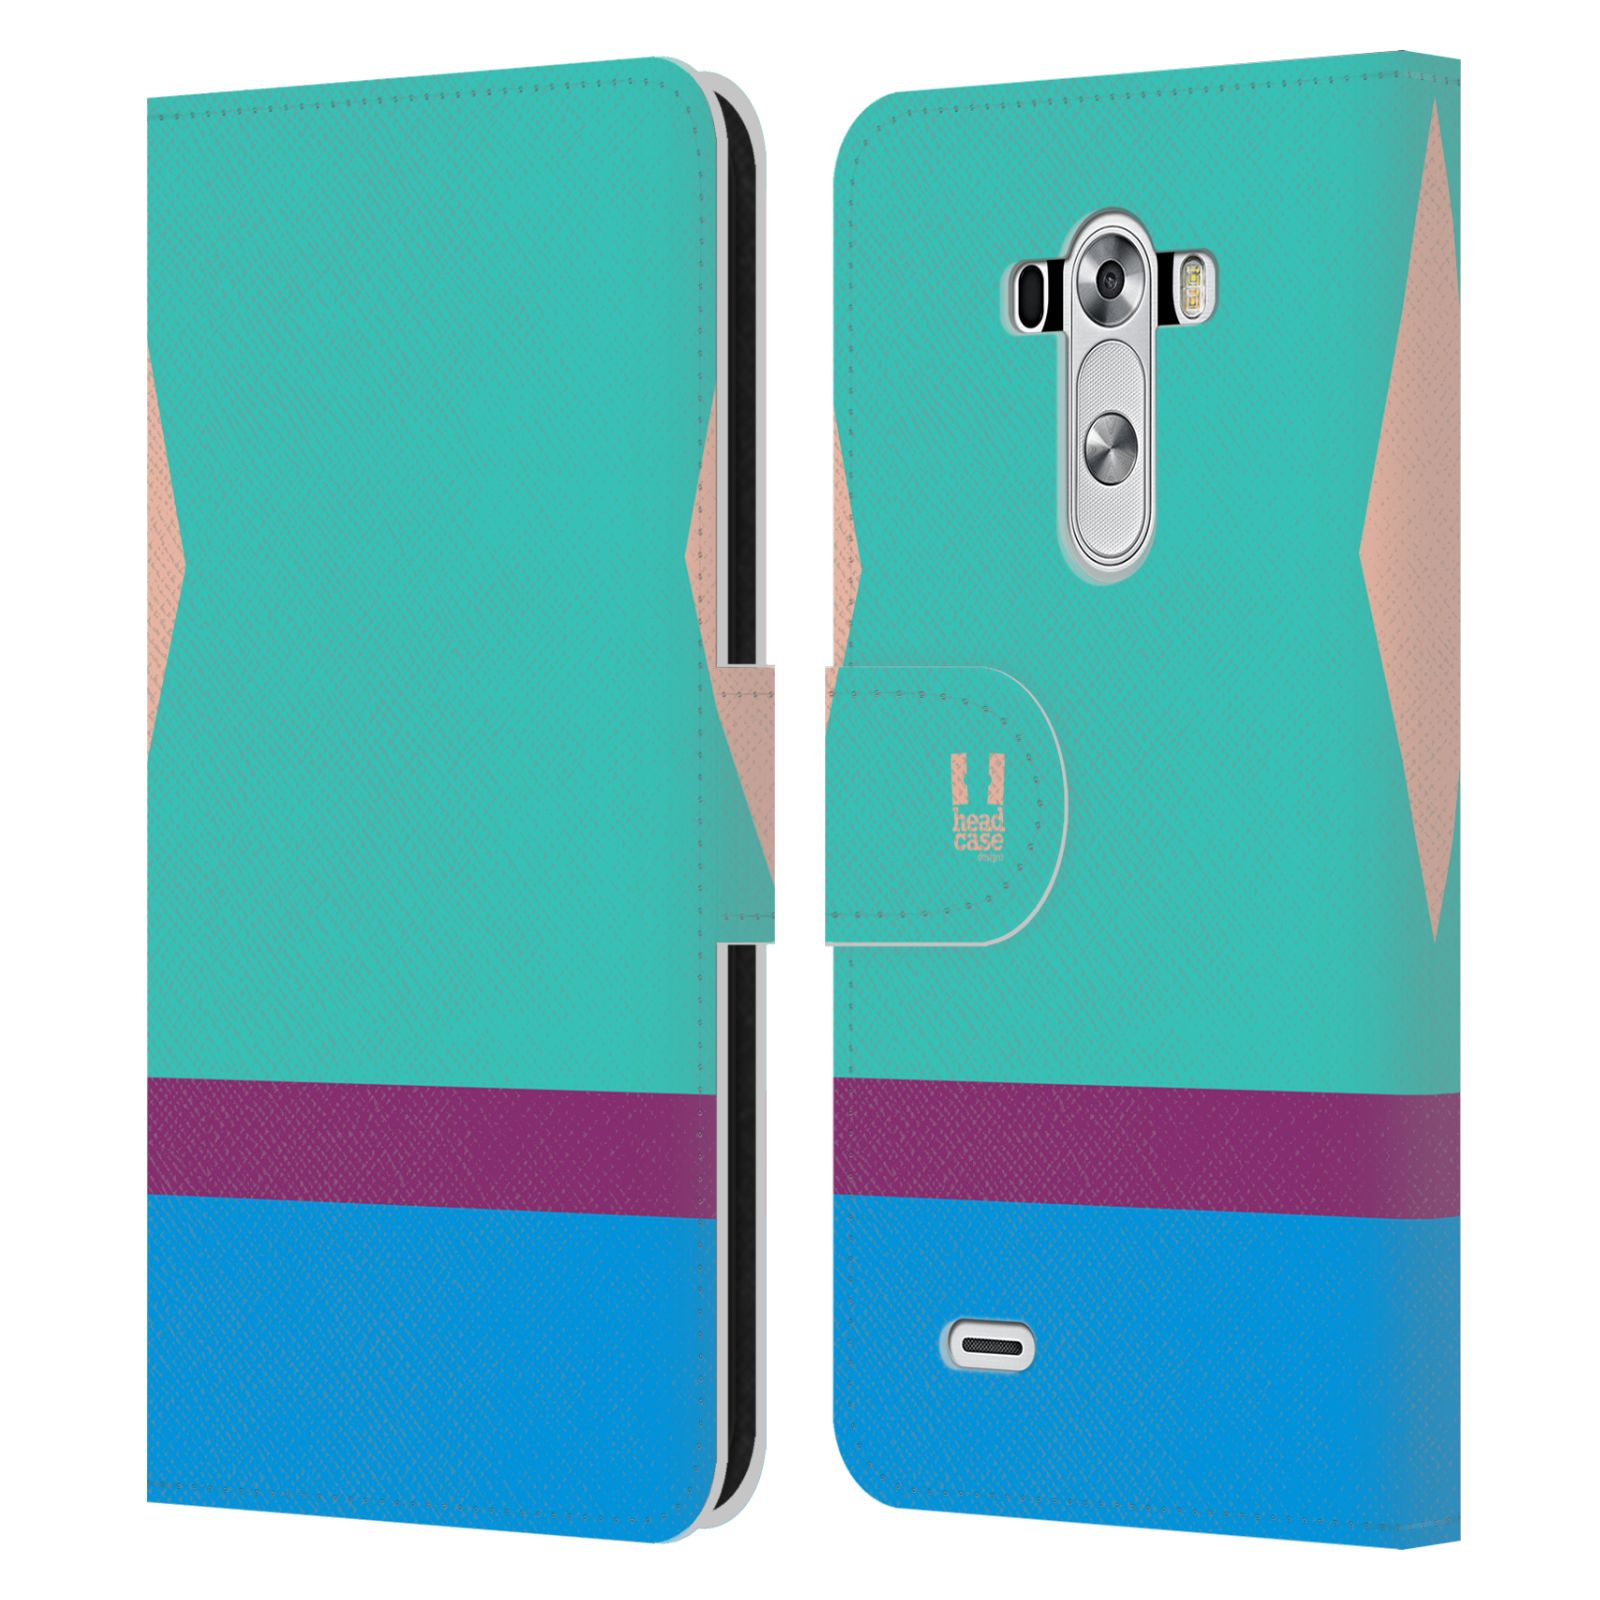 HEAD CASE Flipové pouzdro pro mobil LG G3 barevné tvary modrá a fialový pruh